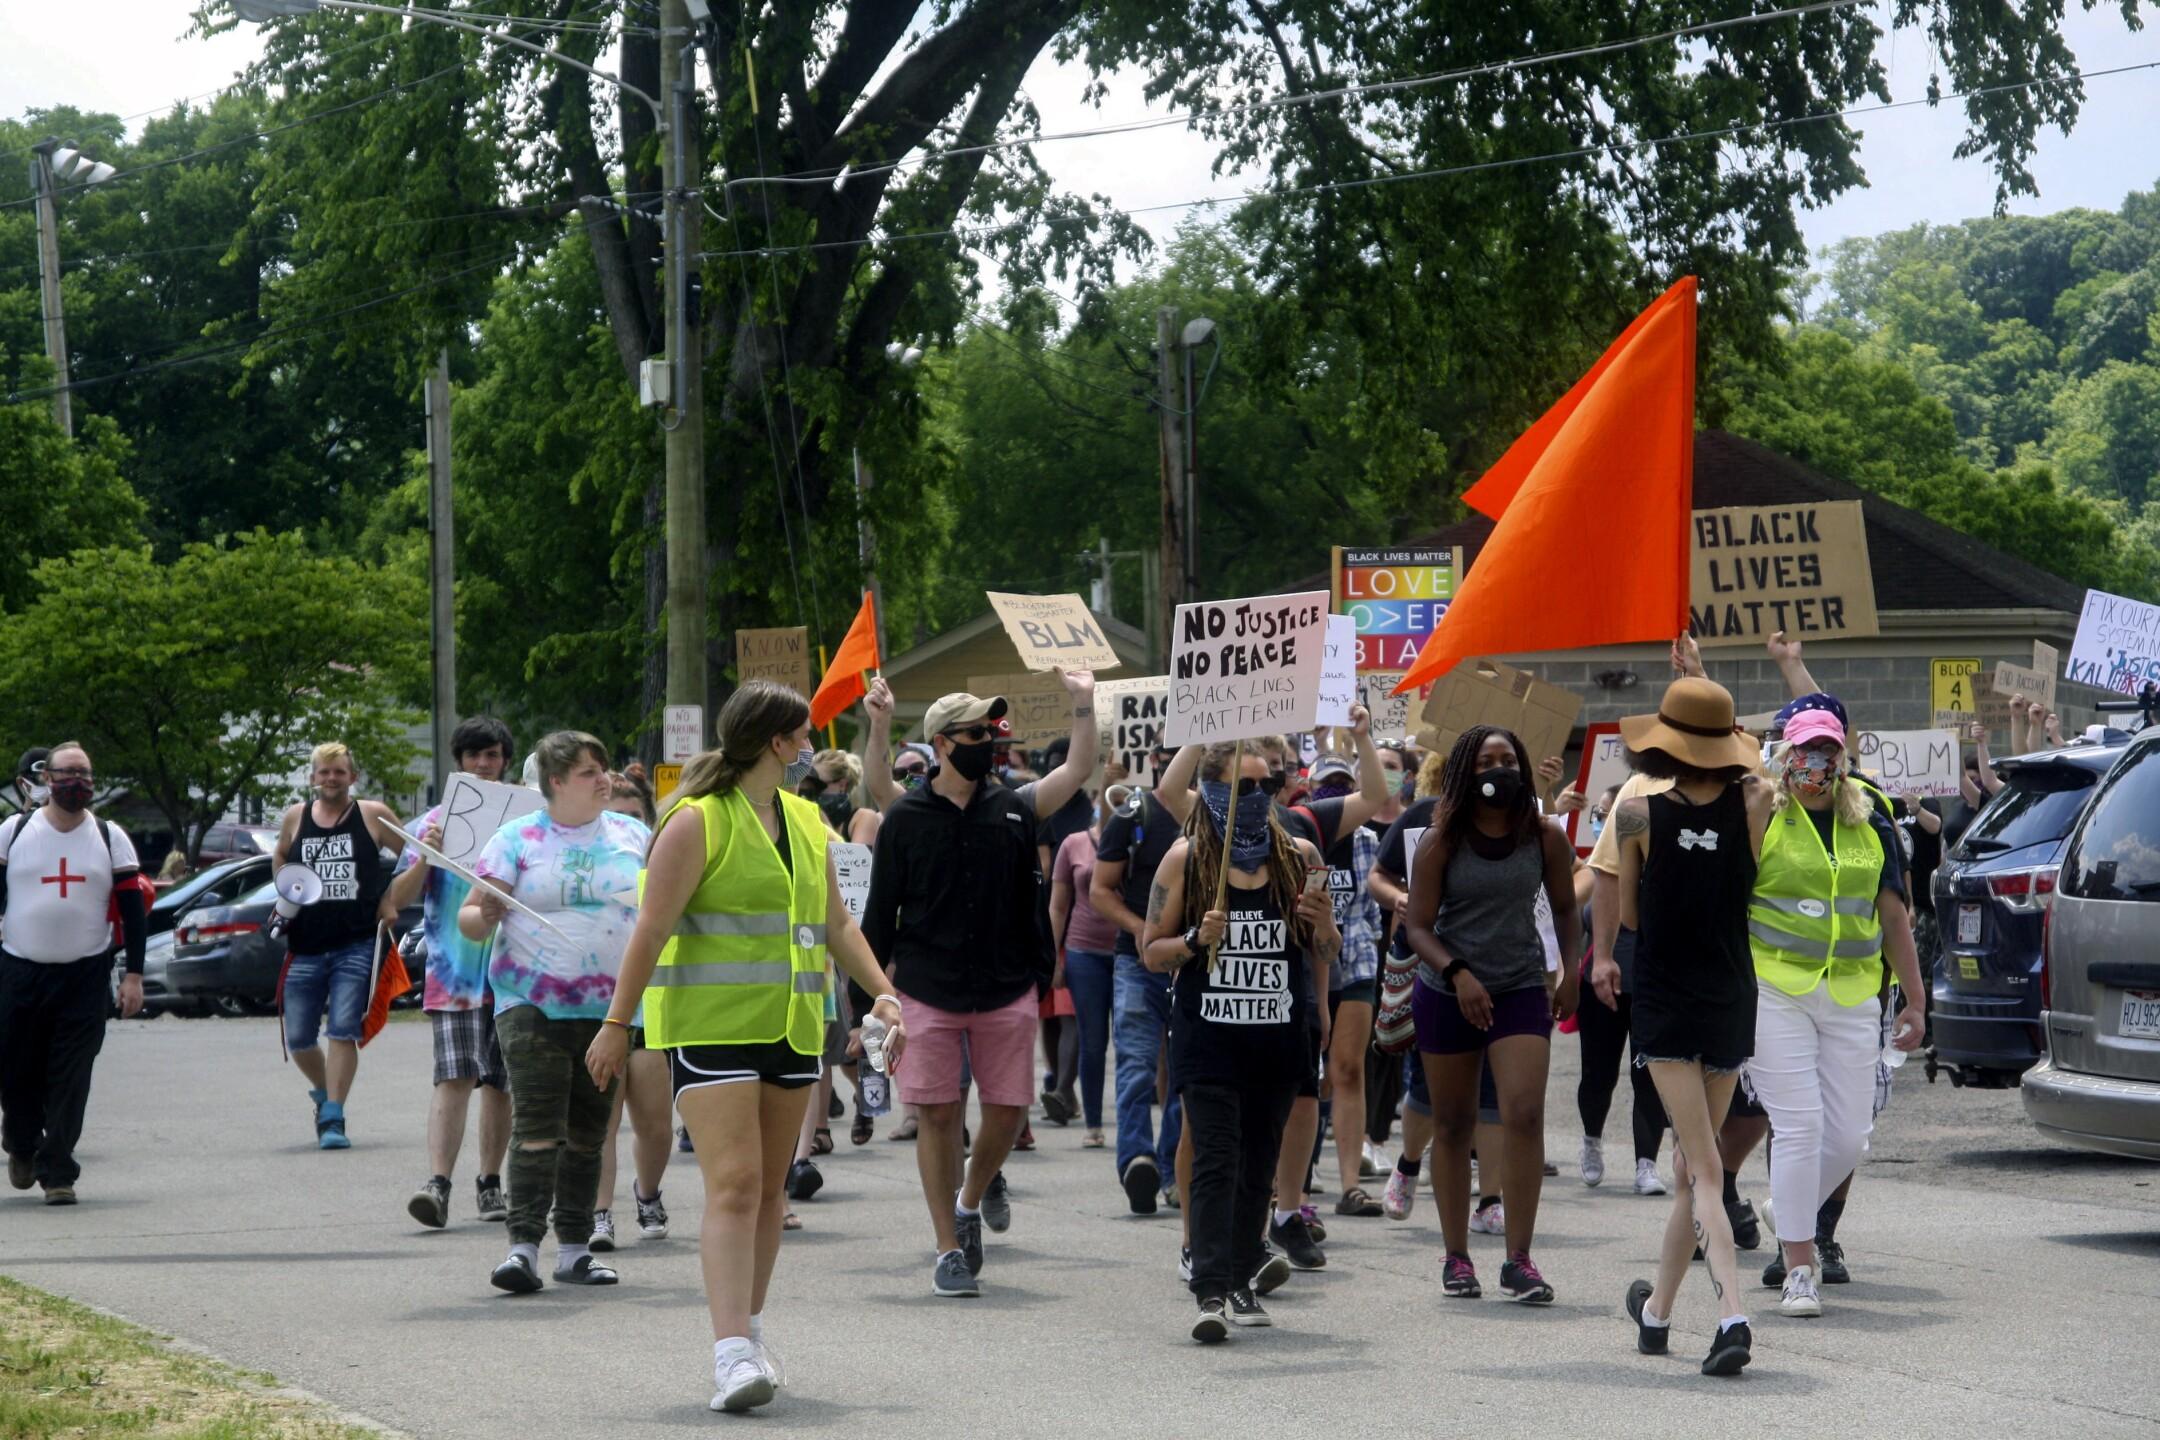 062020_milfordprotest13.jpg